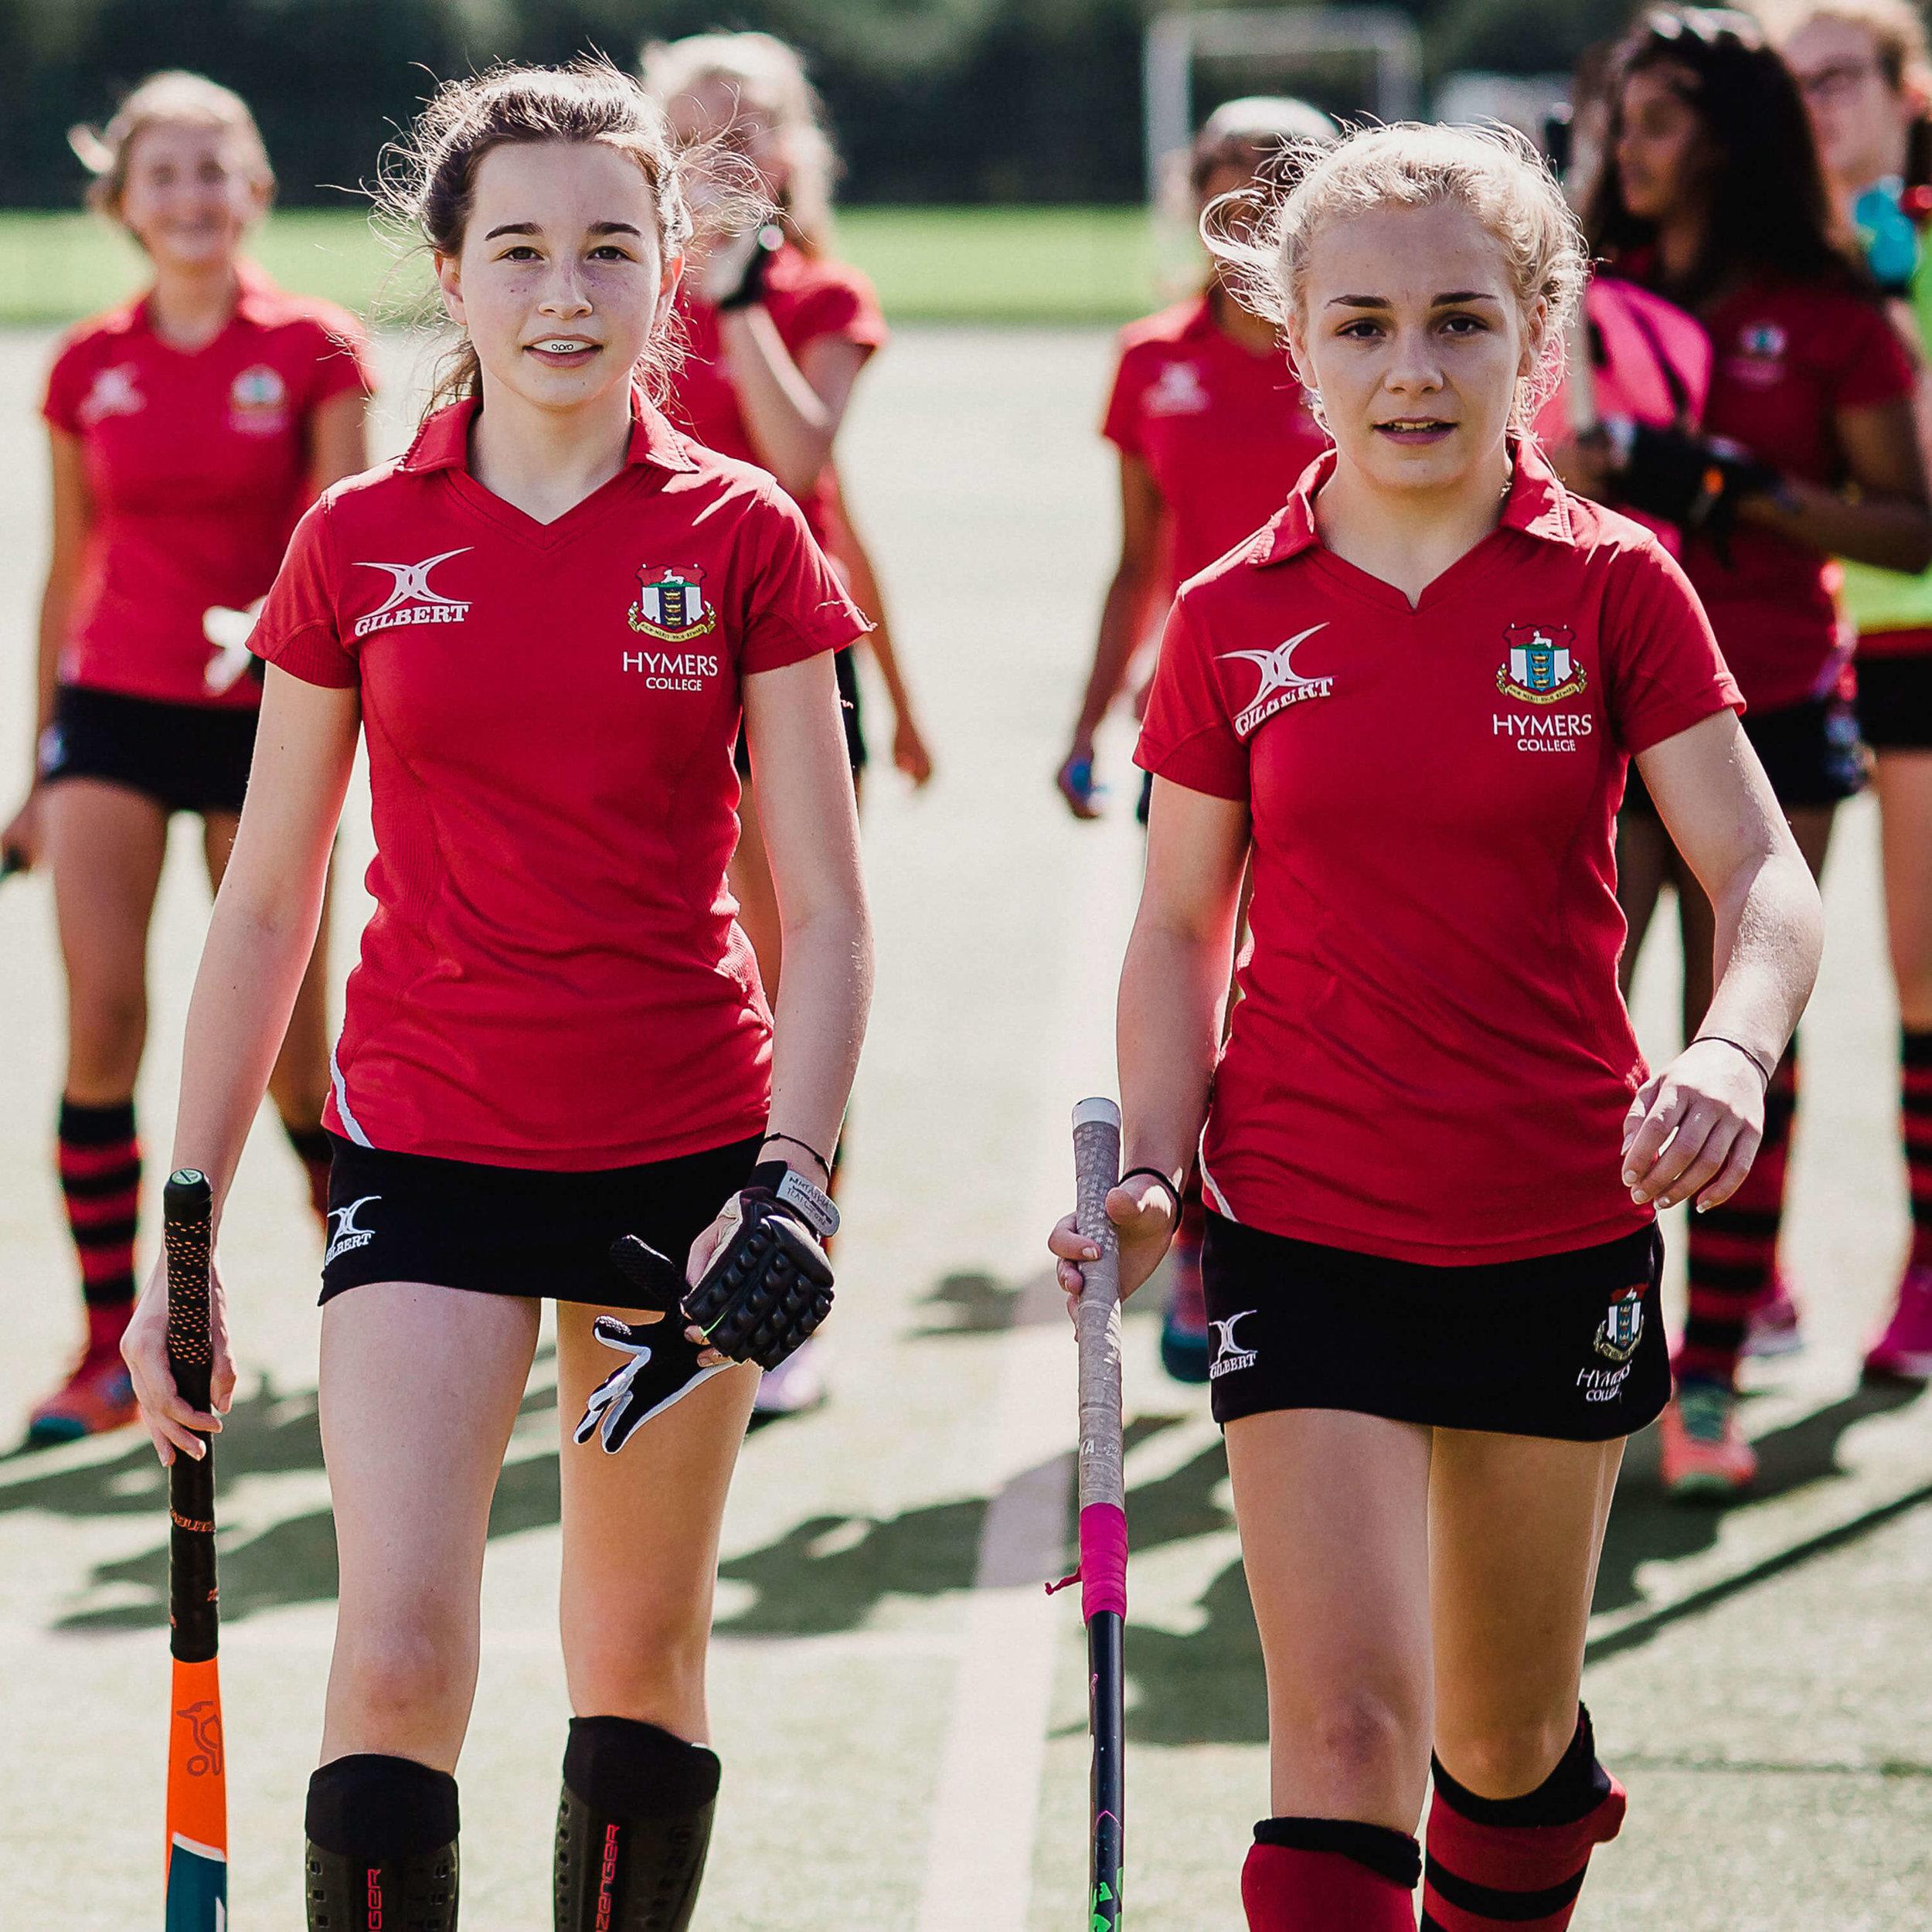 Hessle-Mount-Hymers-Sports-Girls.jpg